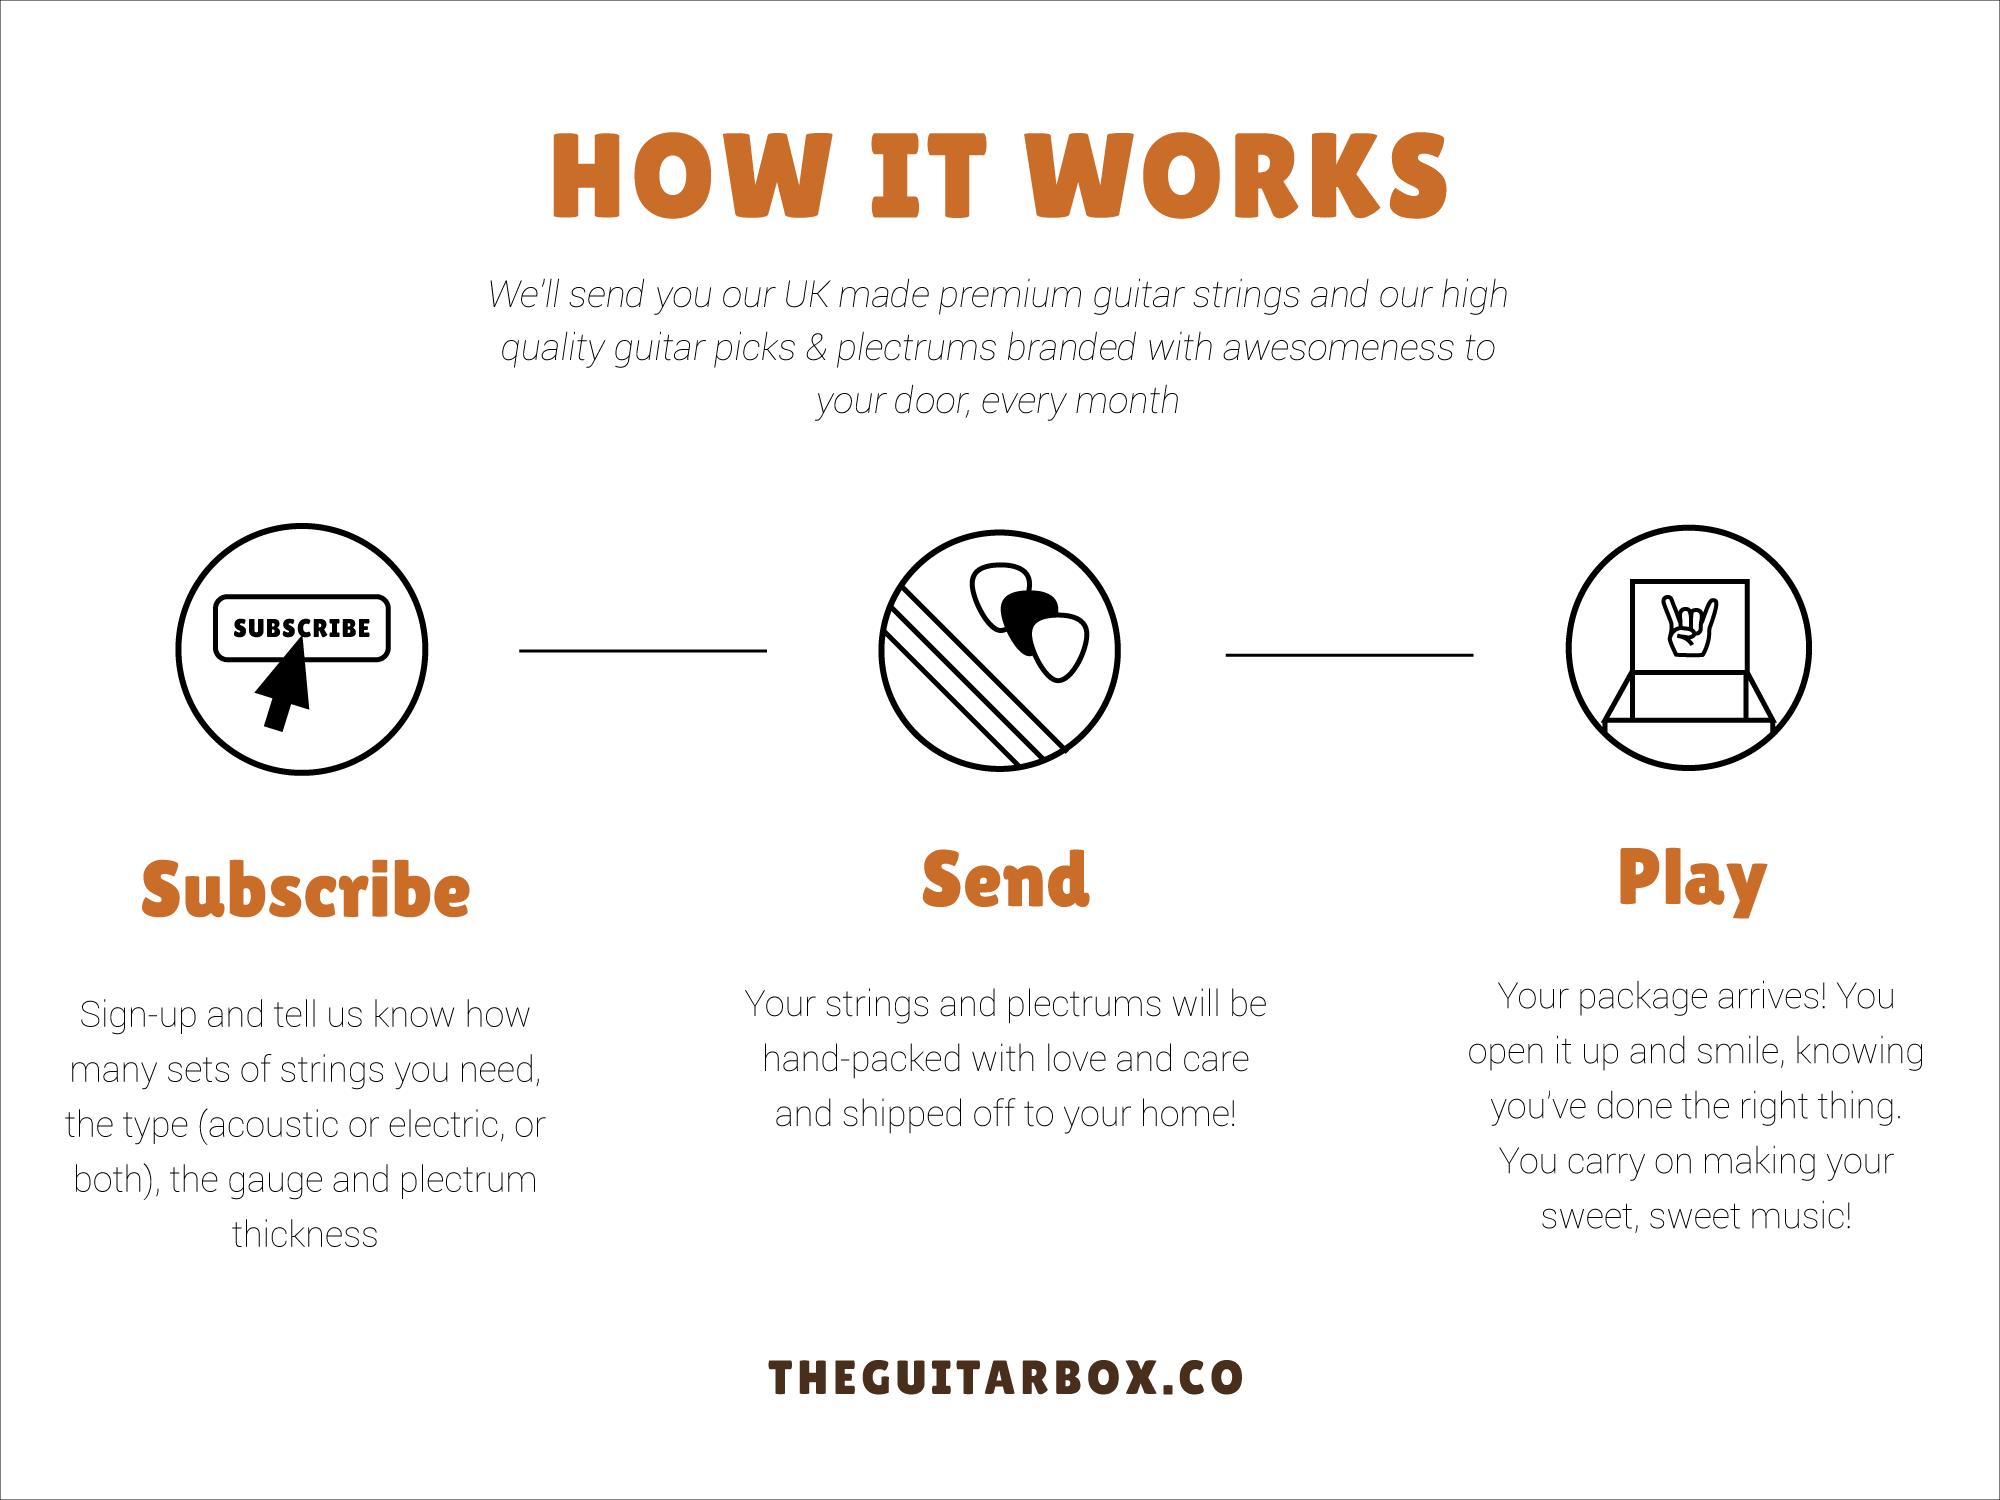 The Guitar Box Co